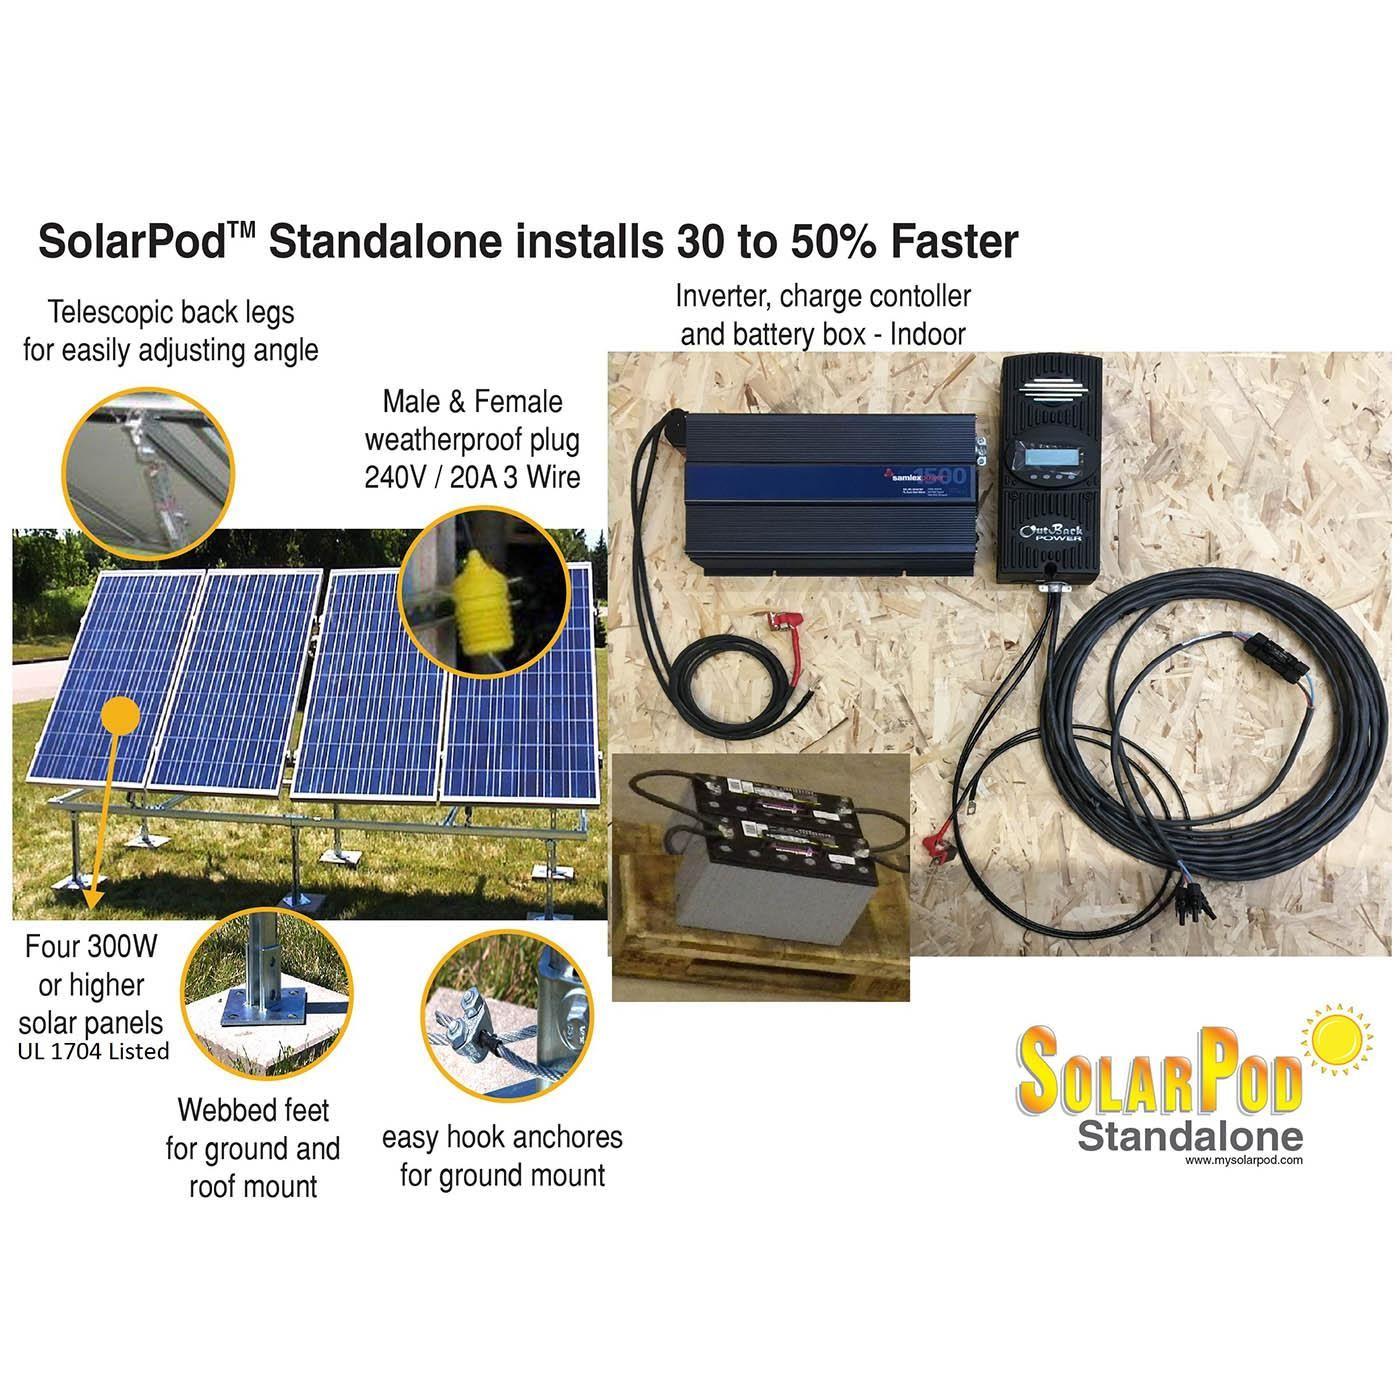 Model 1003 Solarpod Standalone 1 2 Kw Solar Pv System In 2020 Solar Pv Systems Solar Pv System